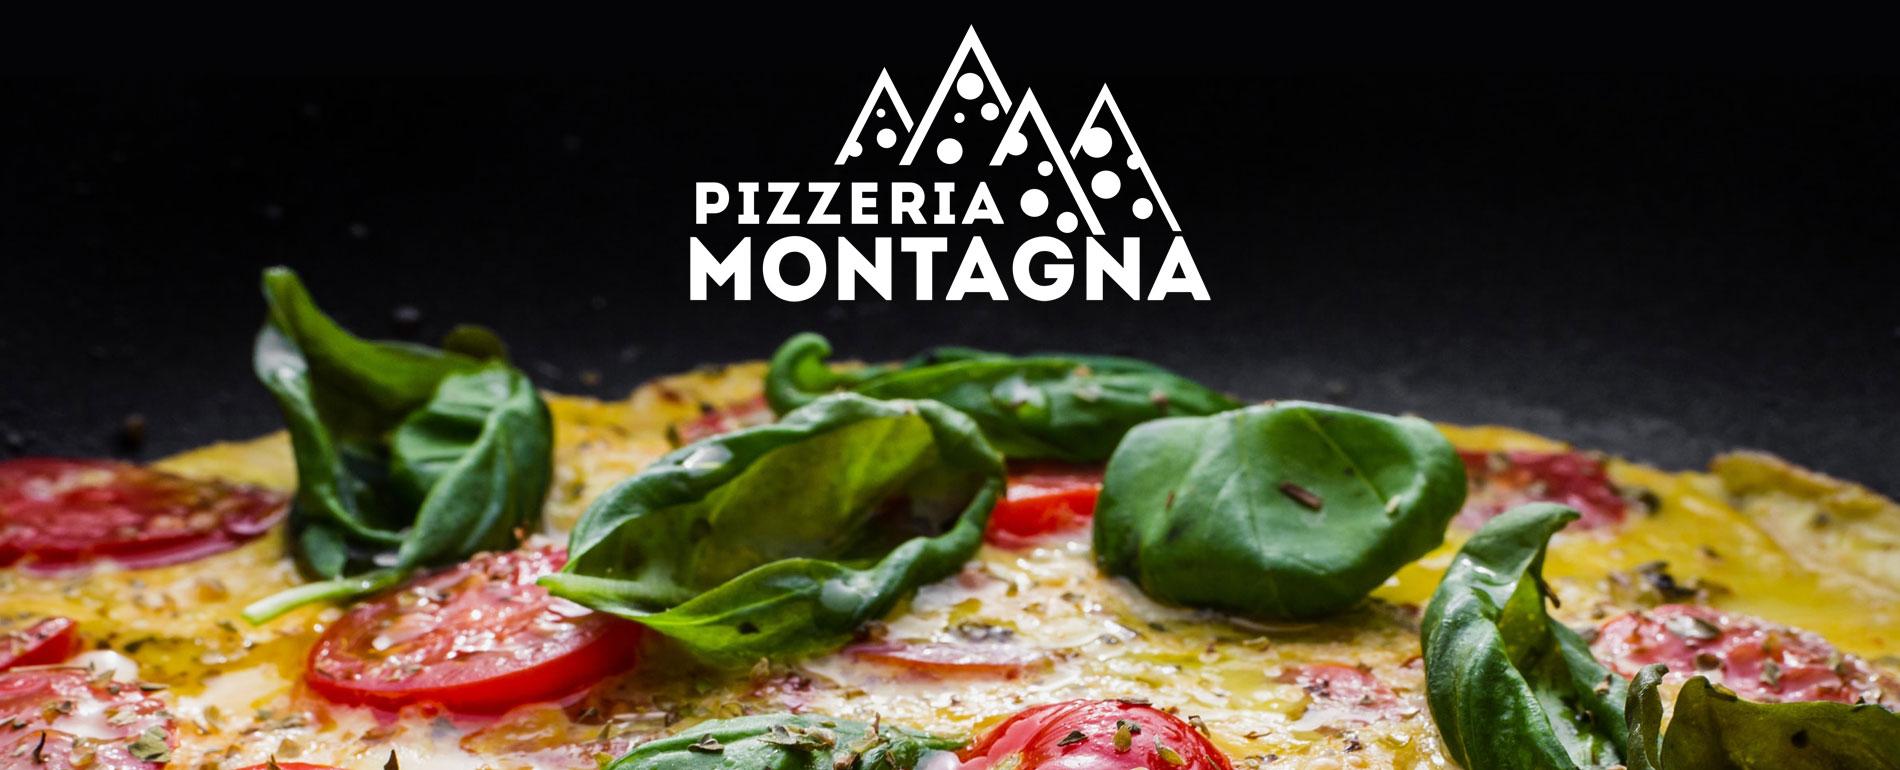 Pizza Montagna Restaurant Mount Airy Casino Resort